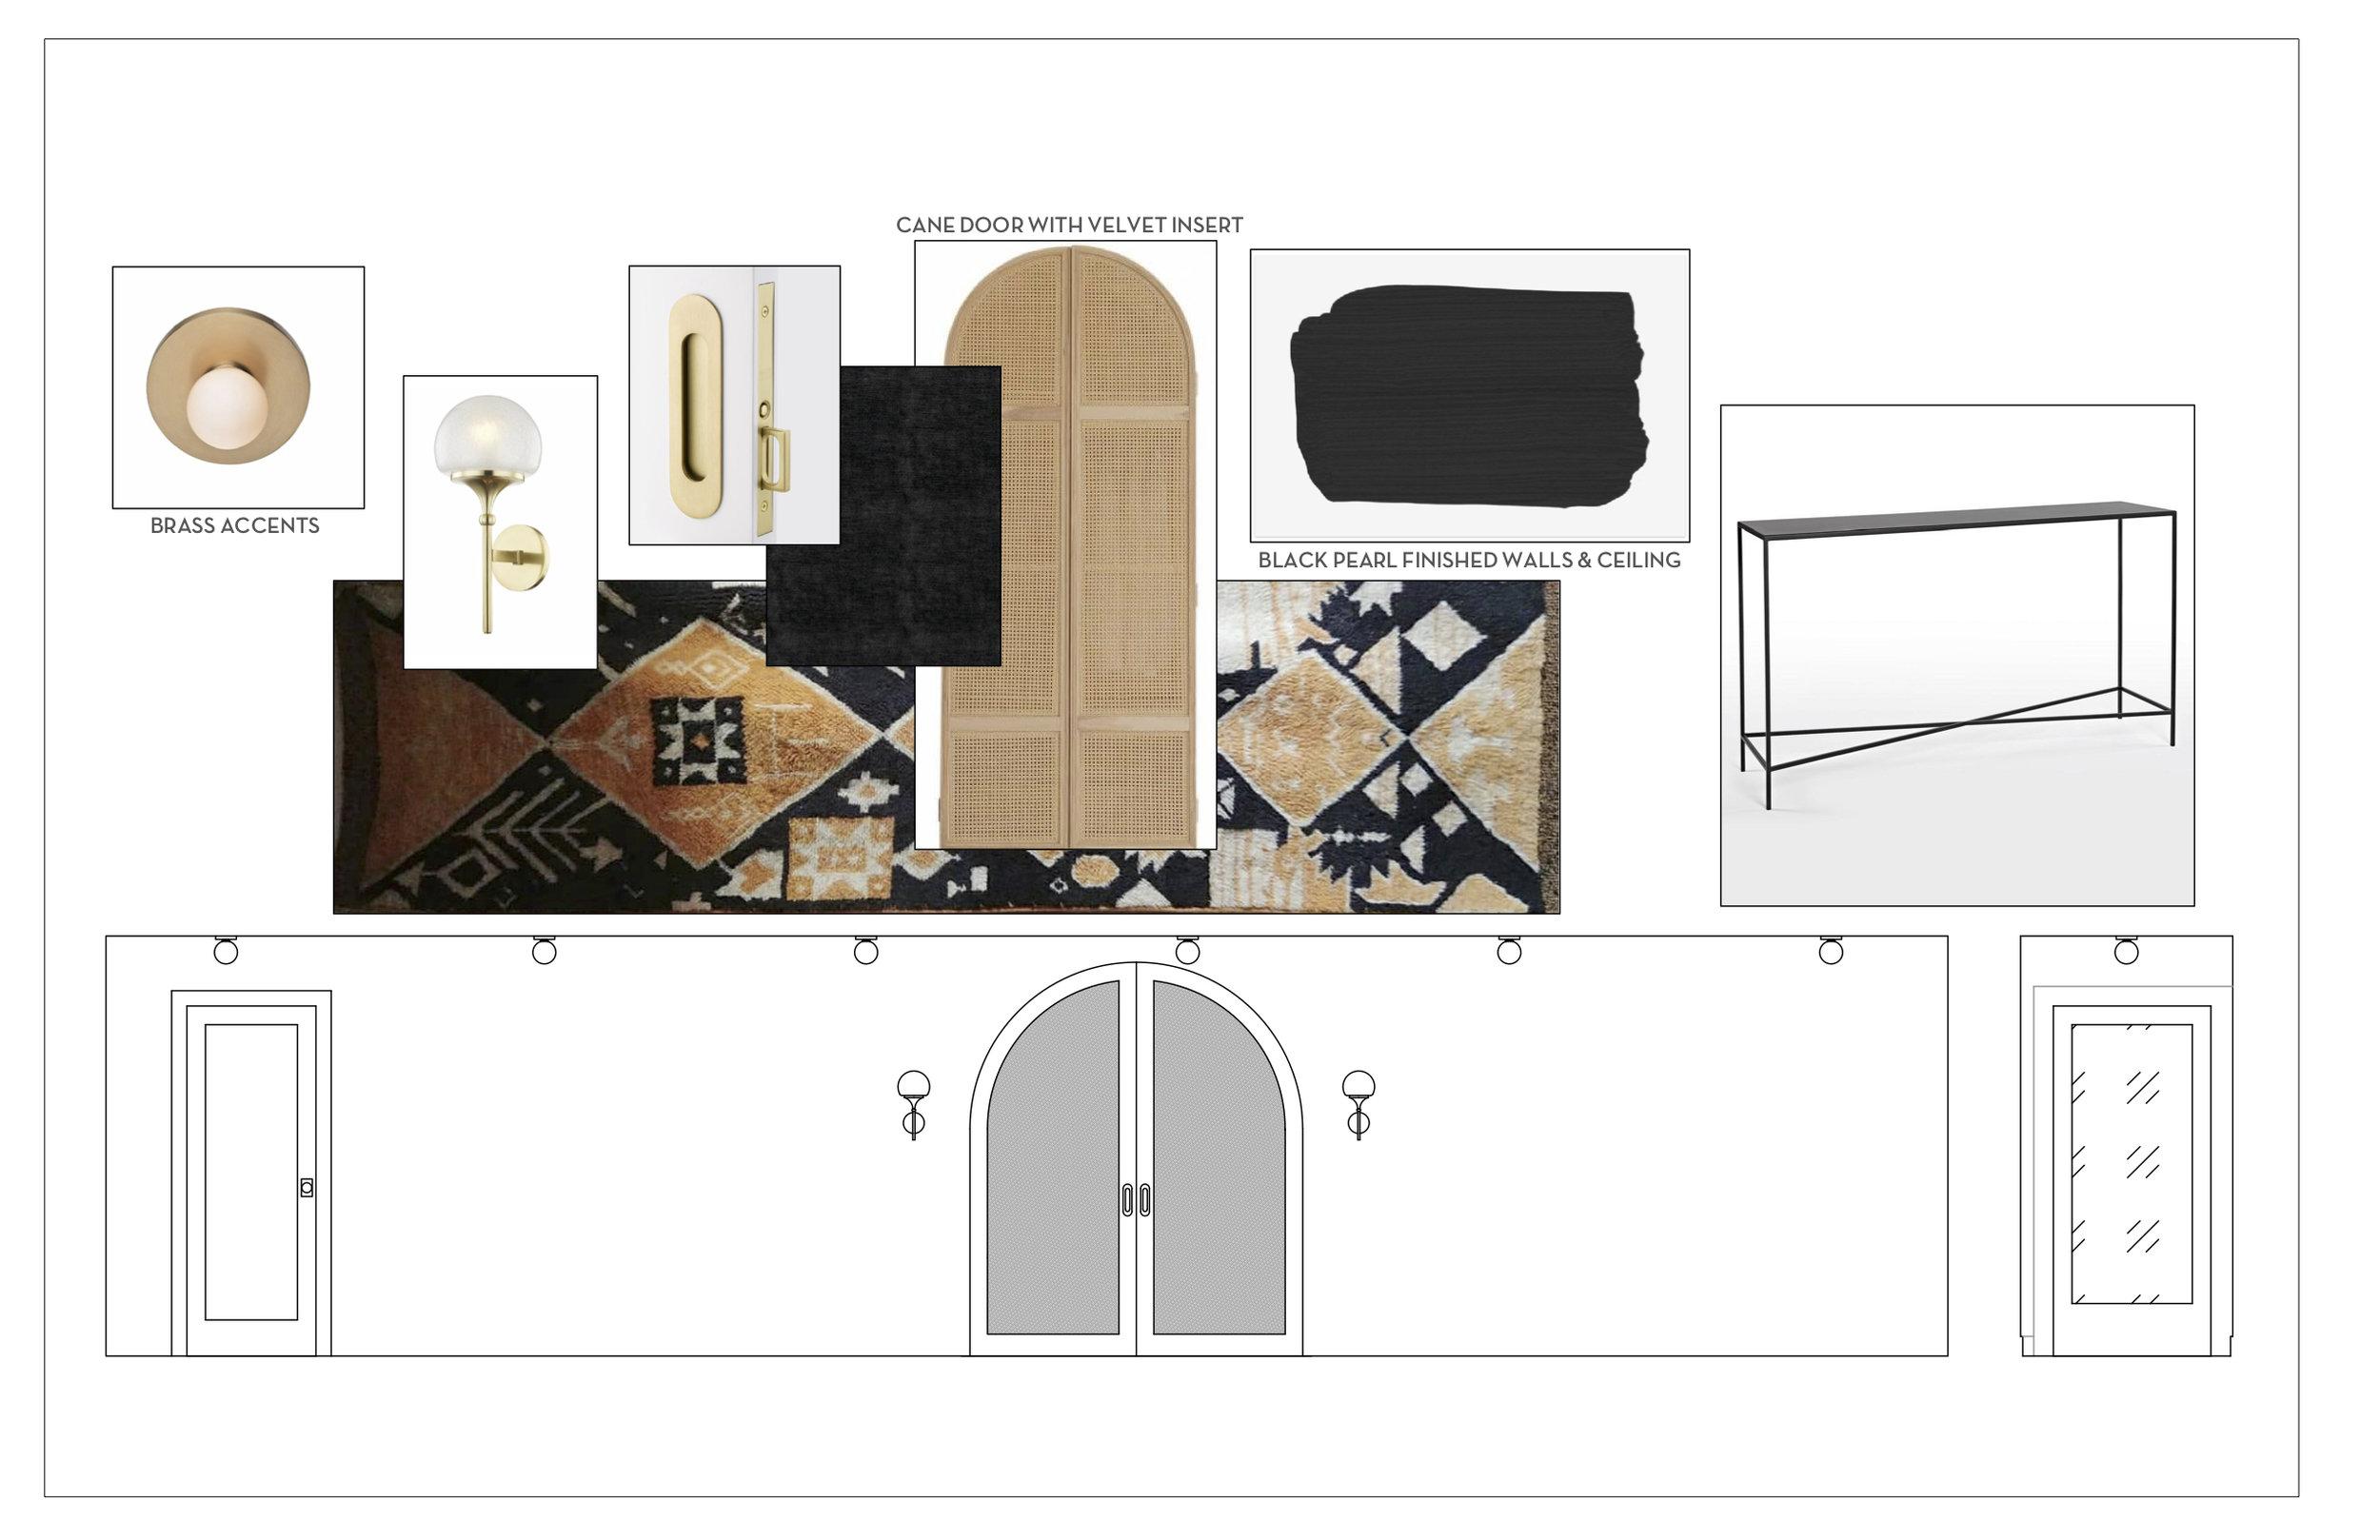 Lighting:  Hudson Valley Lighting  - Door Hardware:  Emtek  - Entry Table:  Rejuvenation  - Moroccan Runner:  Shkoon  - Caned Arched Pocket Door:  Hommeboys  x  Rottmayer Design + Build  - Black Velvet Panels:  Fabricut